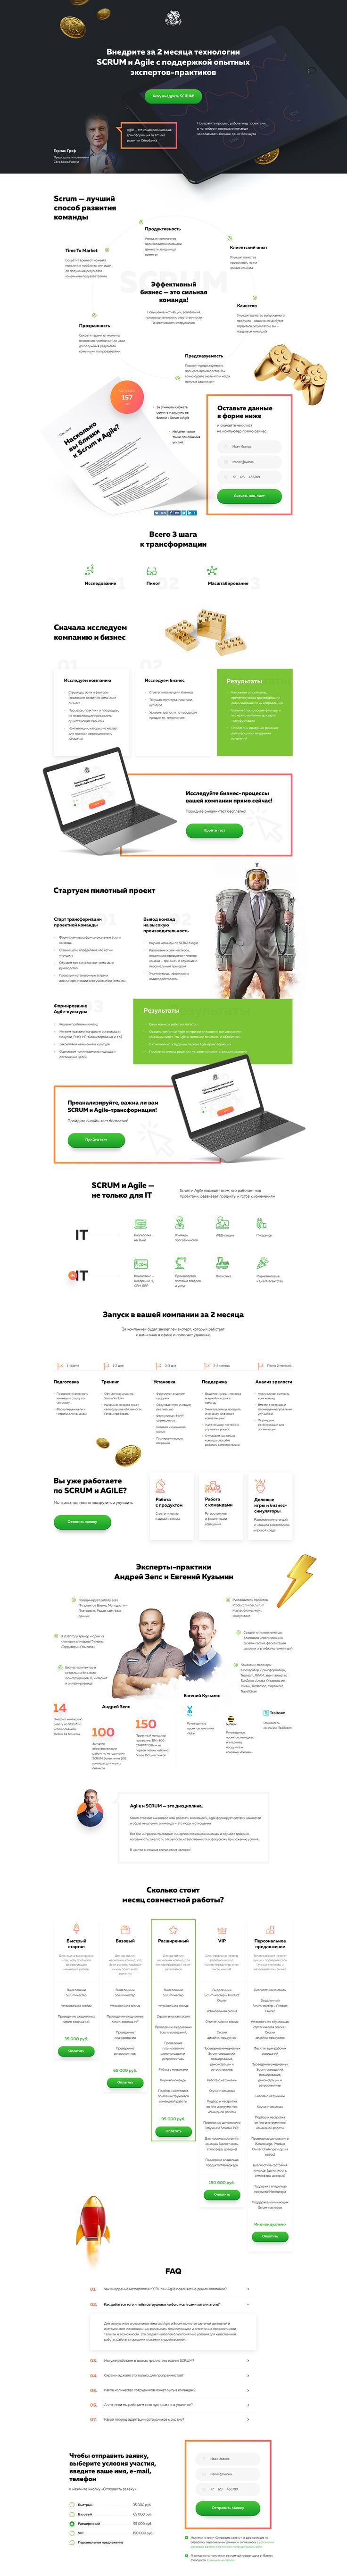 Ознакомьтесь с моим проектом @Behance: «Landing page for BM — SCRUM and Agile technology» https://www.behance.net/gallery/58324333/Landing-page-for-BM-SCRUM-and-Agile-technology